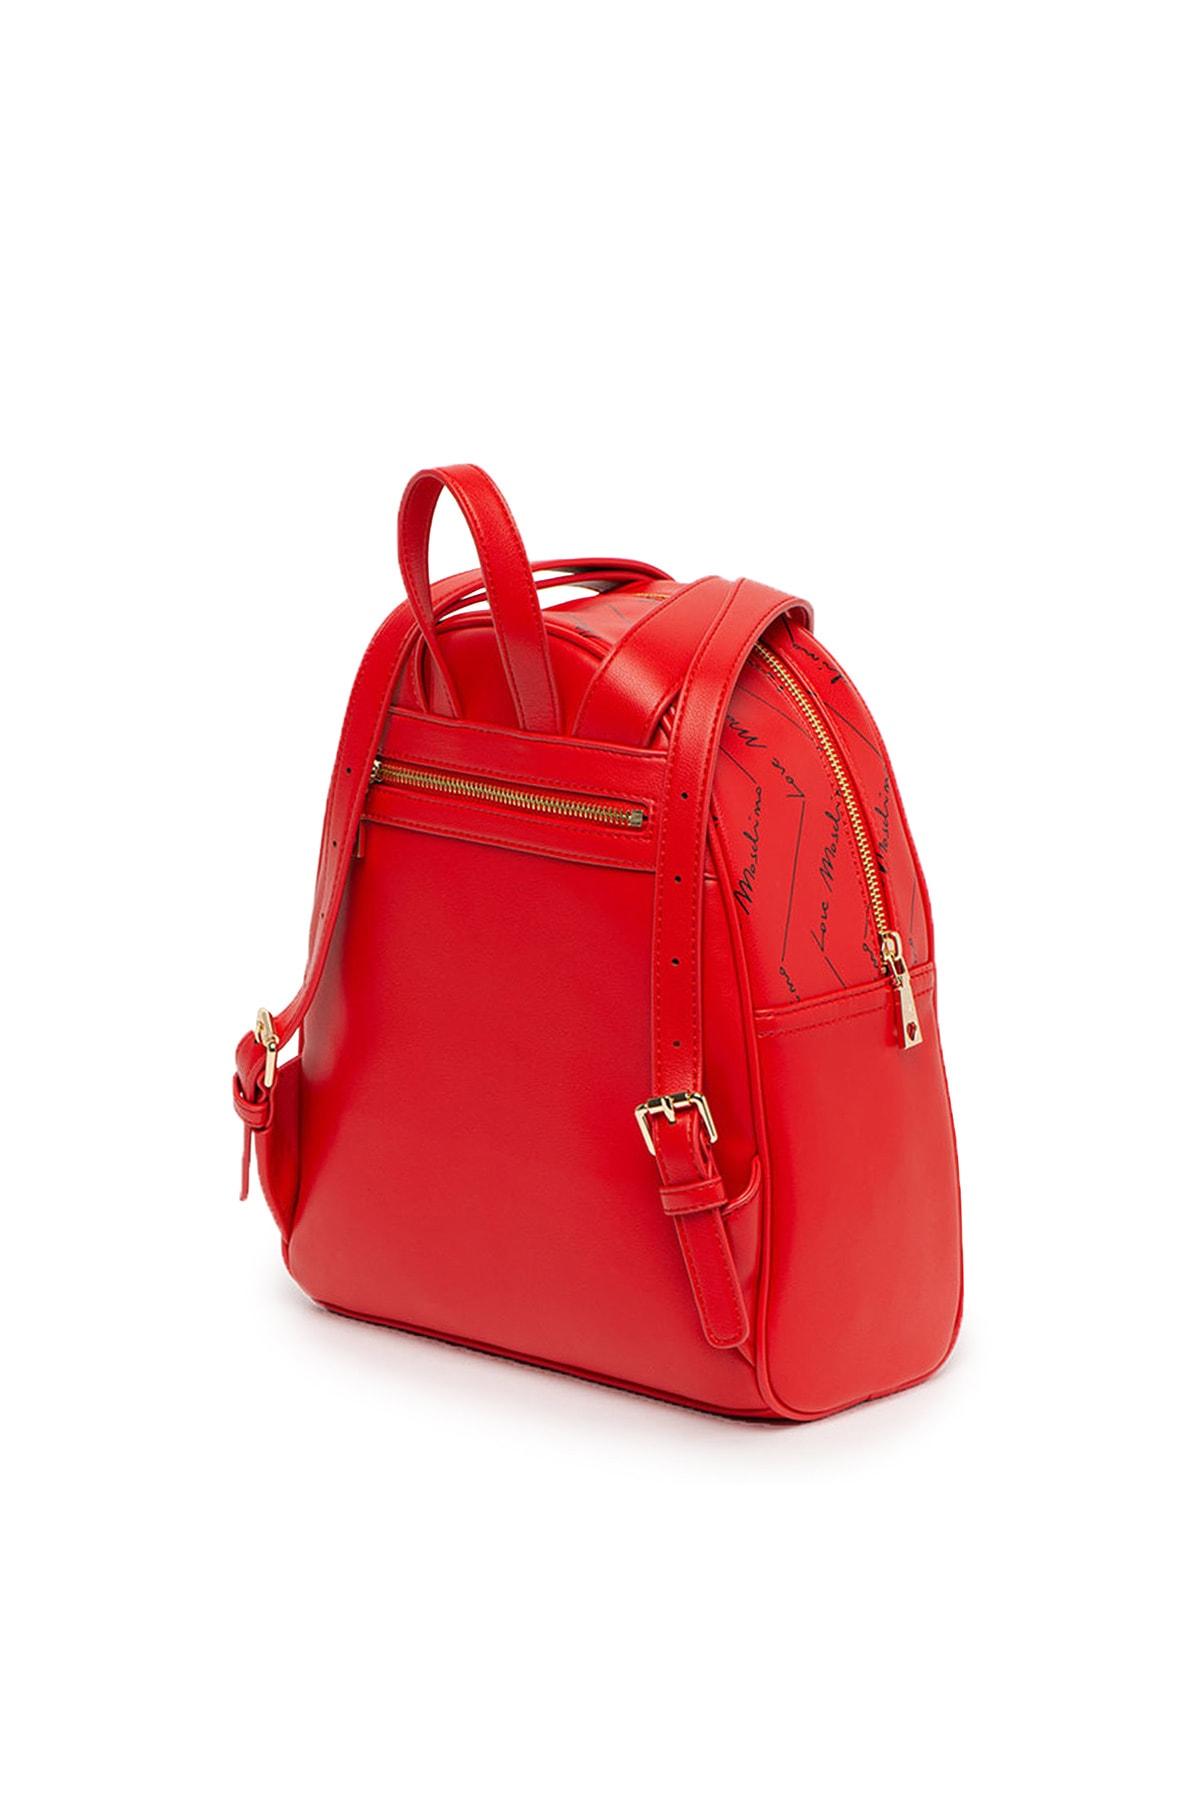 Love Moschino Kadın Kırmızı Sırt Çantası Jc4245pp0bkh0500 2